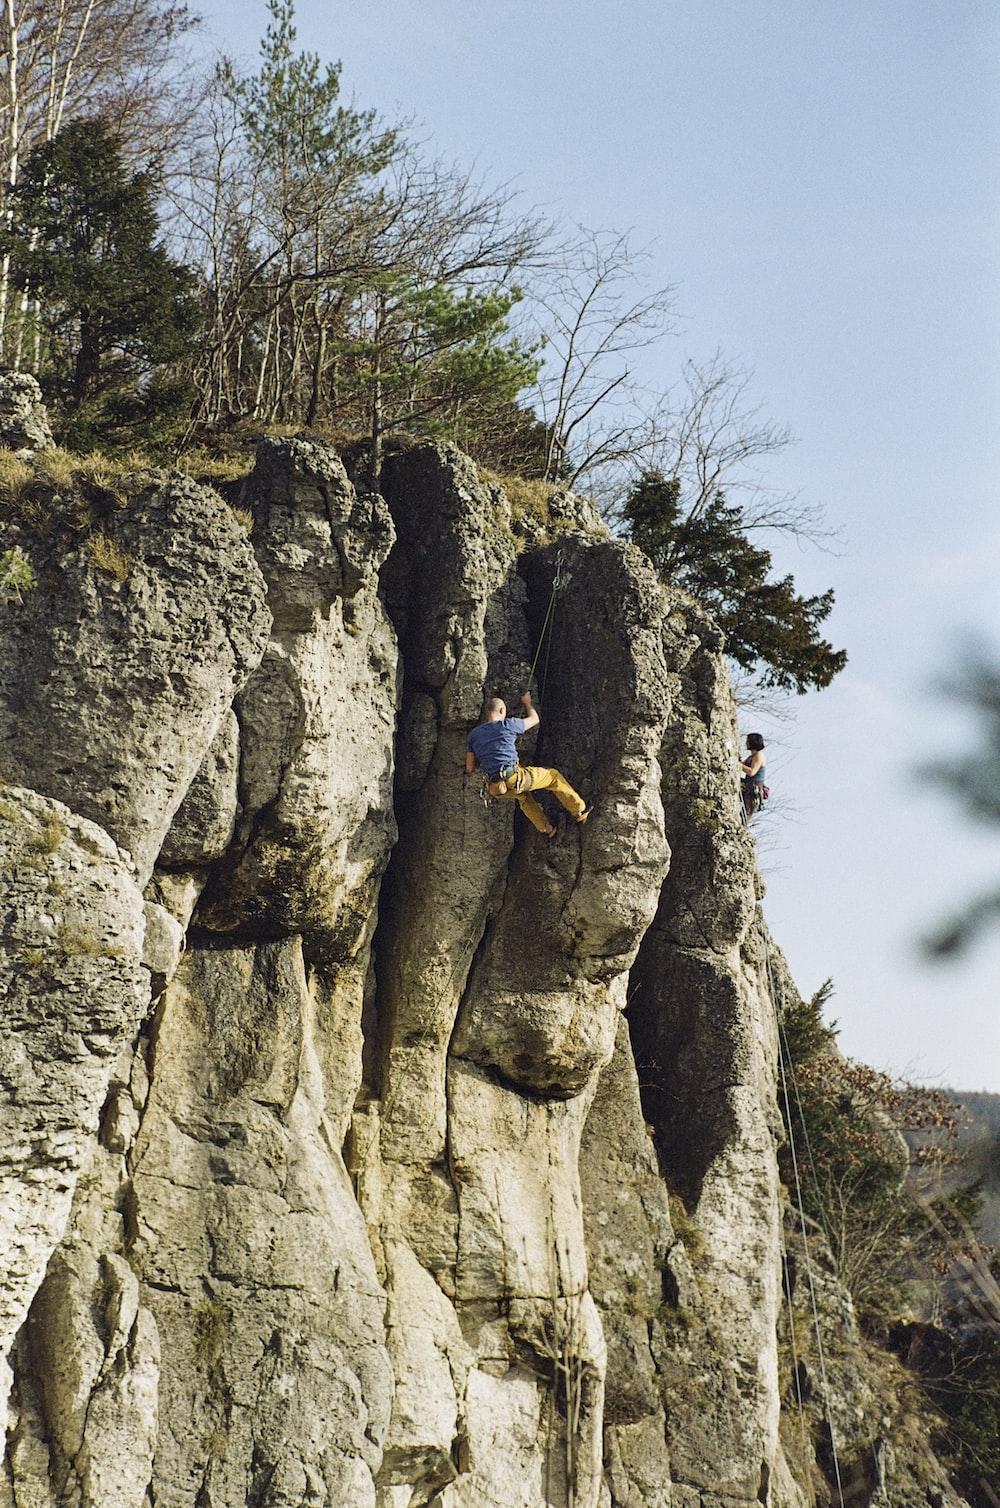 man in yellow jacket climbing on rocky mountain during daytime